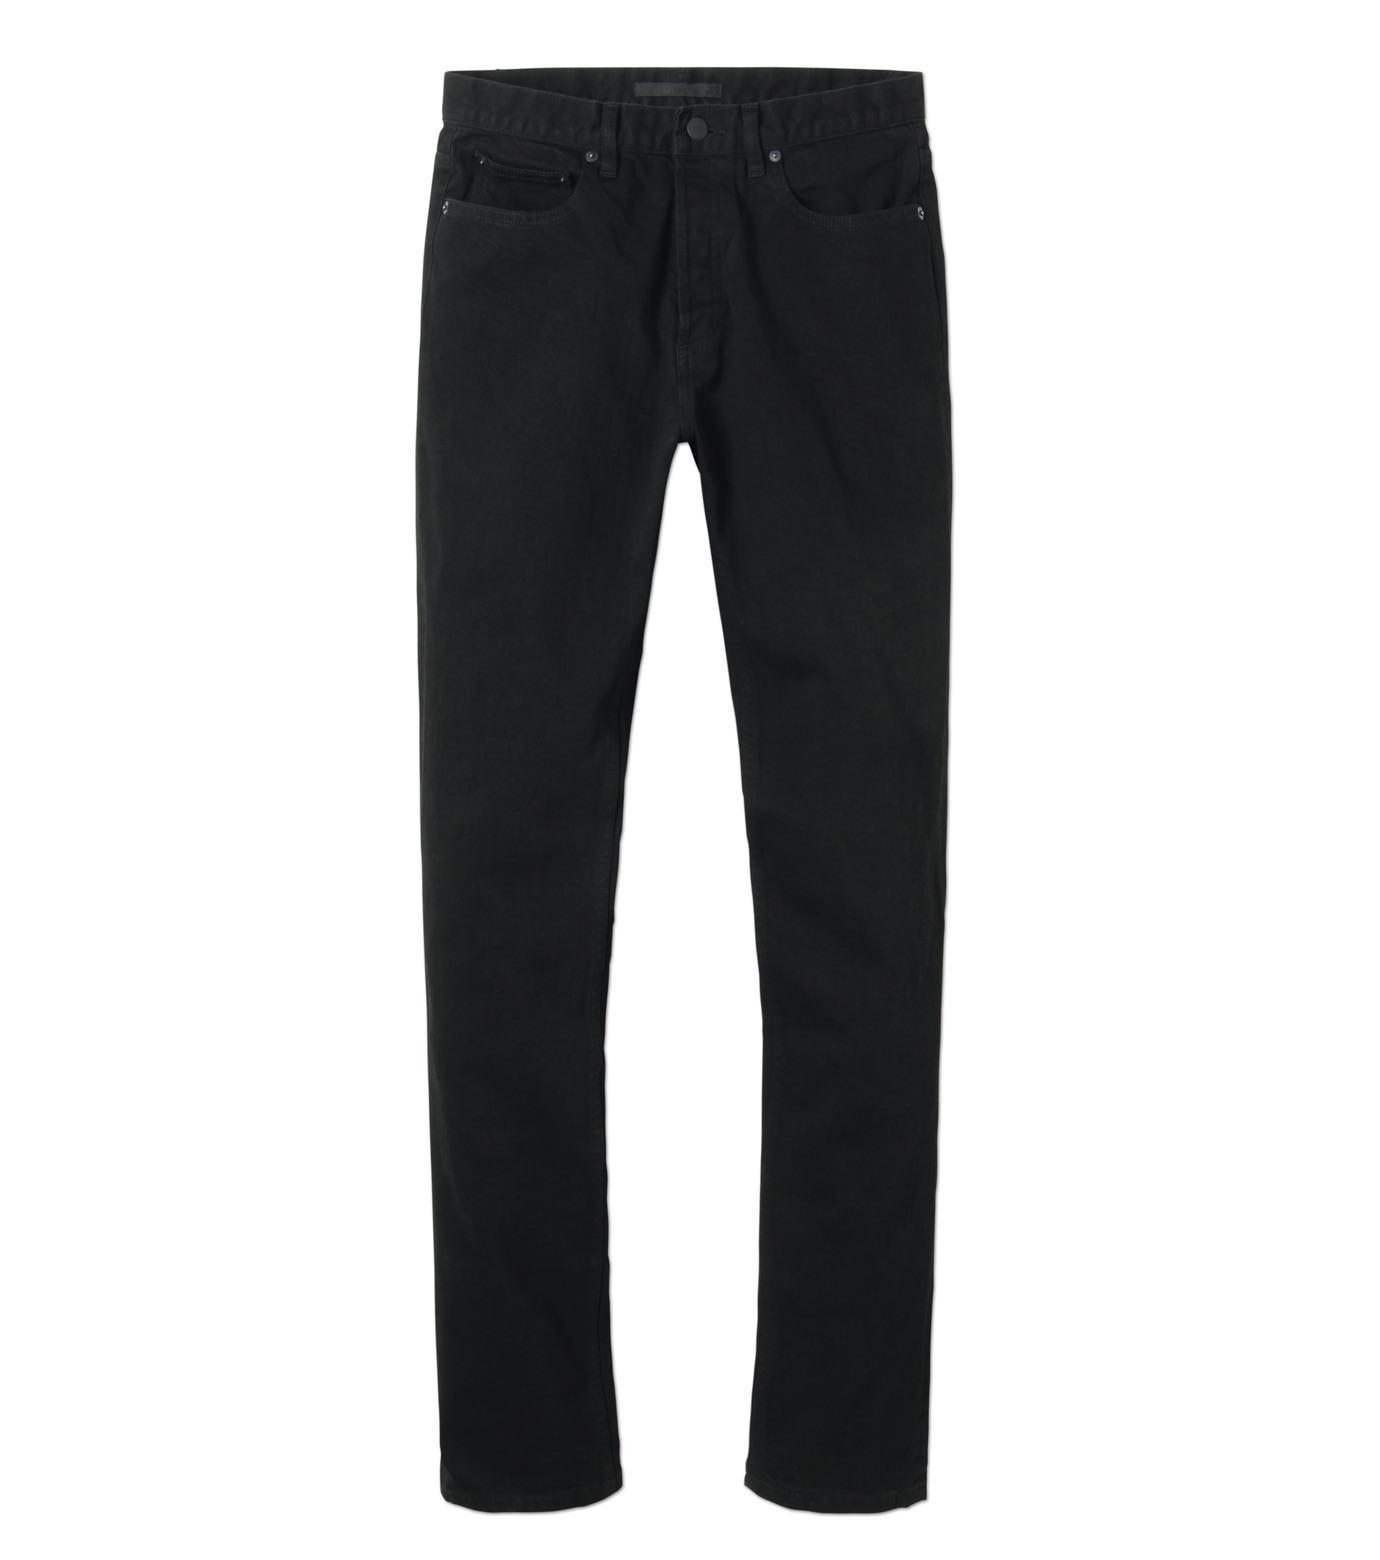 HL HEDDIE LOVU(エイチエル・エディールーヴ)のBLACK DENIM SLIM-BLACK(パンツ/pants)-17A98007-13 拡大詳細画像4